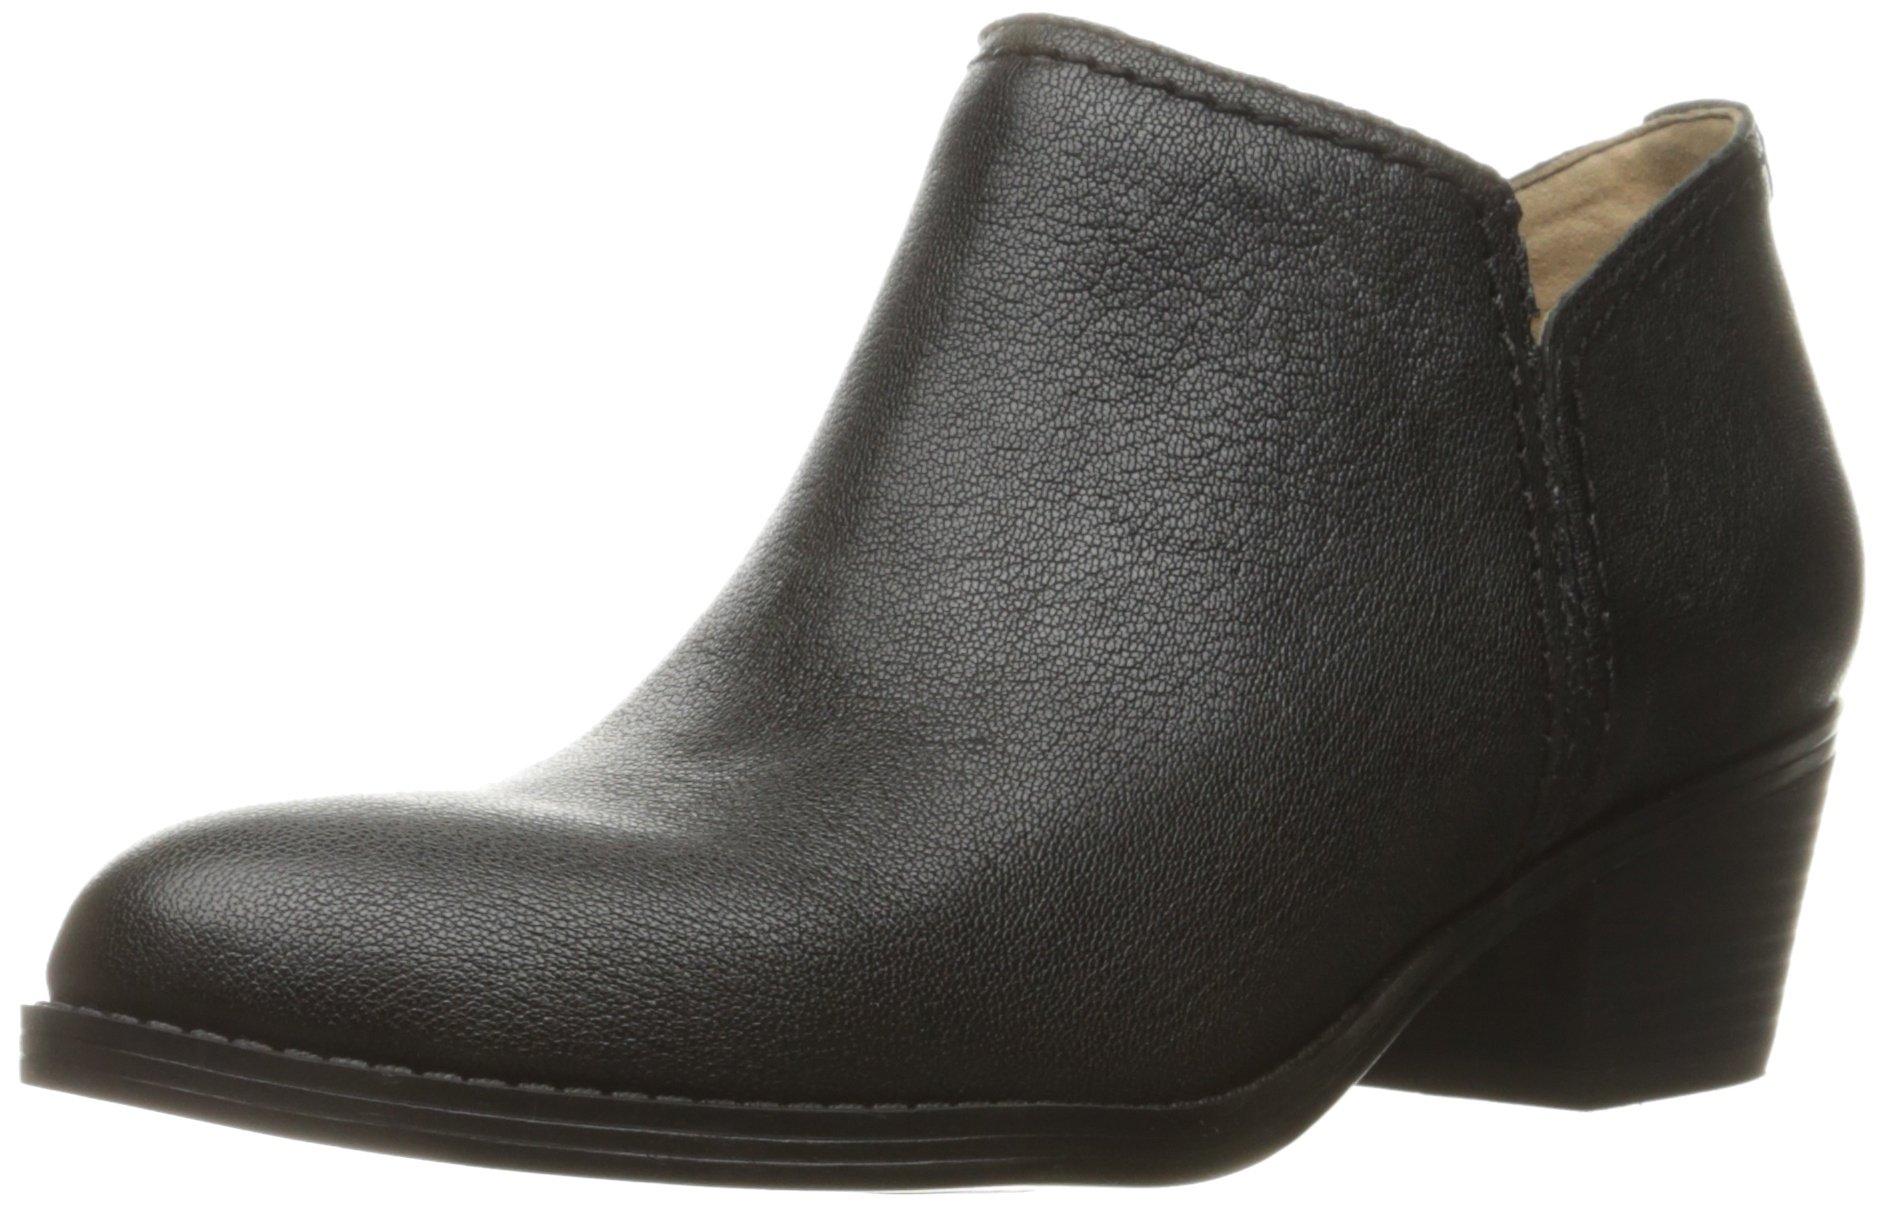 Naturalizer Women's Zarie Boot, Black, 8.5 M US